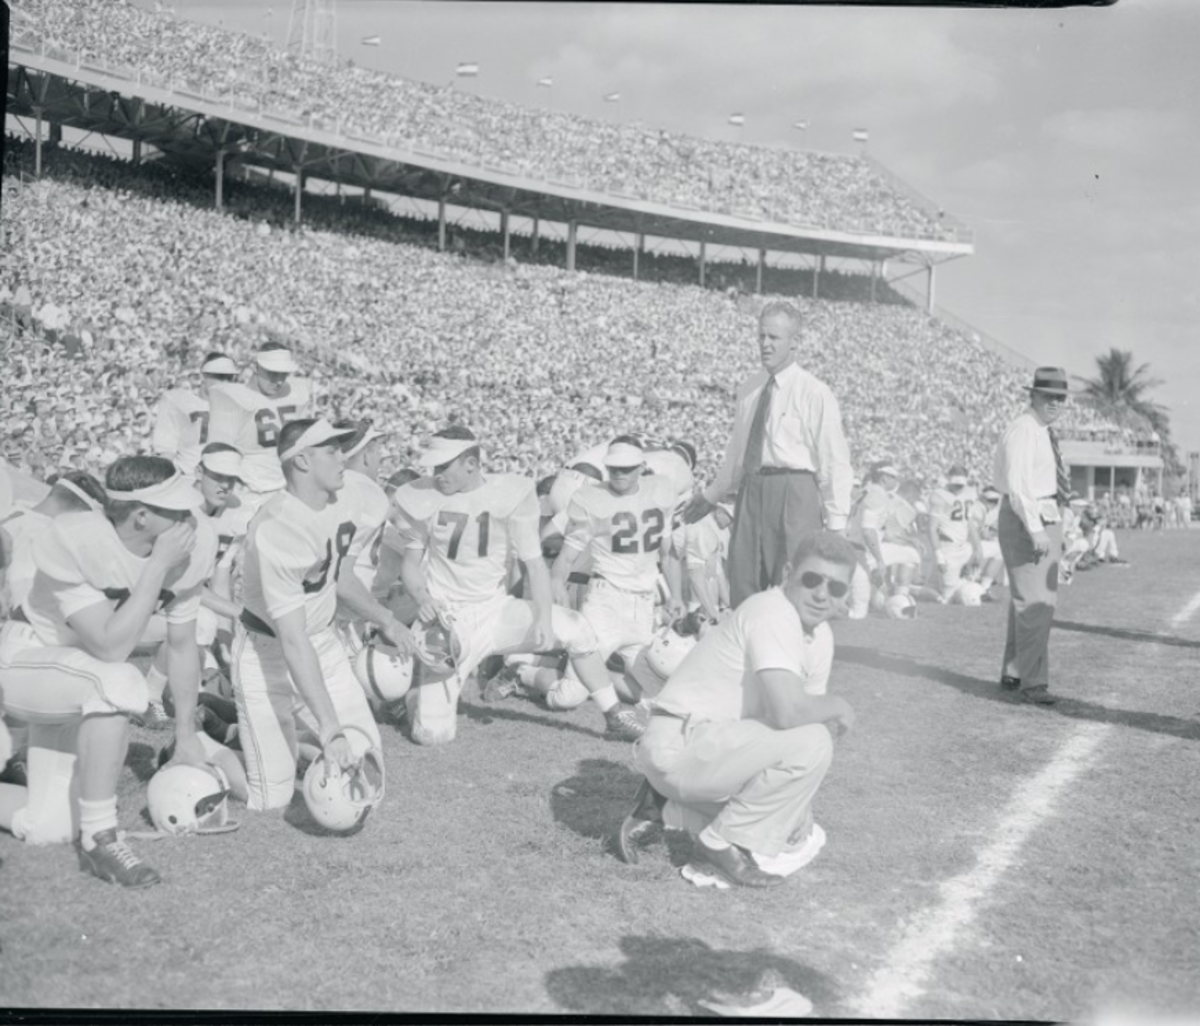 Bud Wilkinson, 1956 Orange Bowl